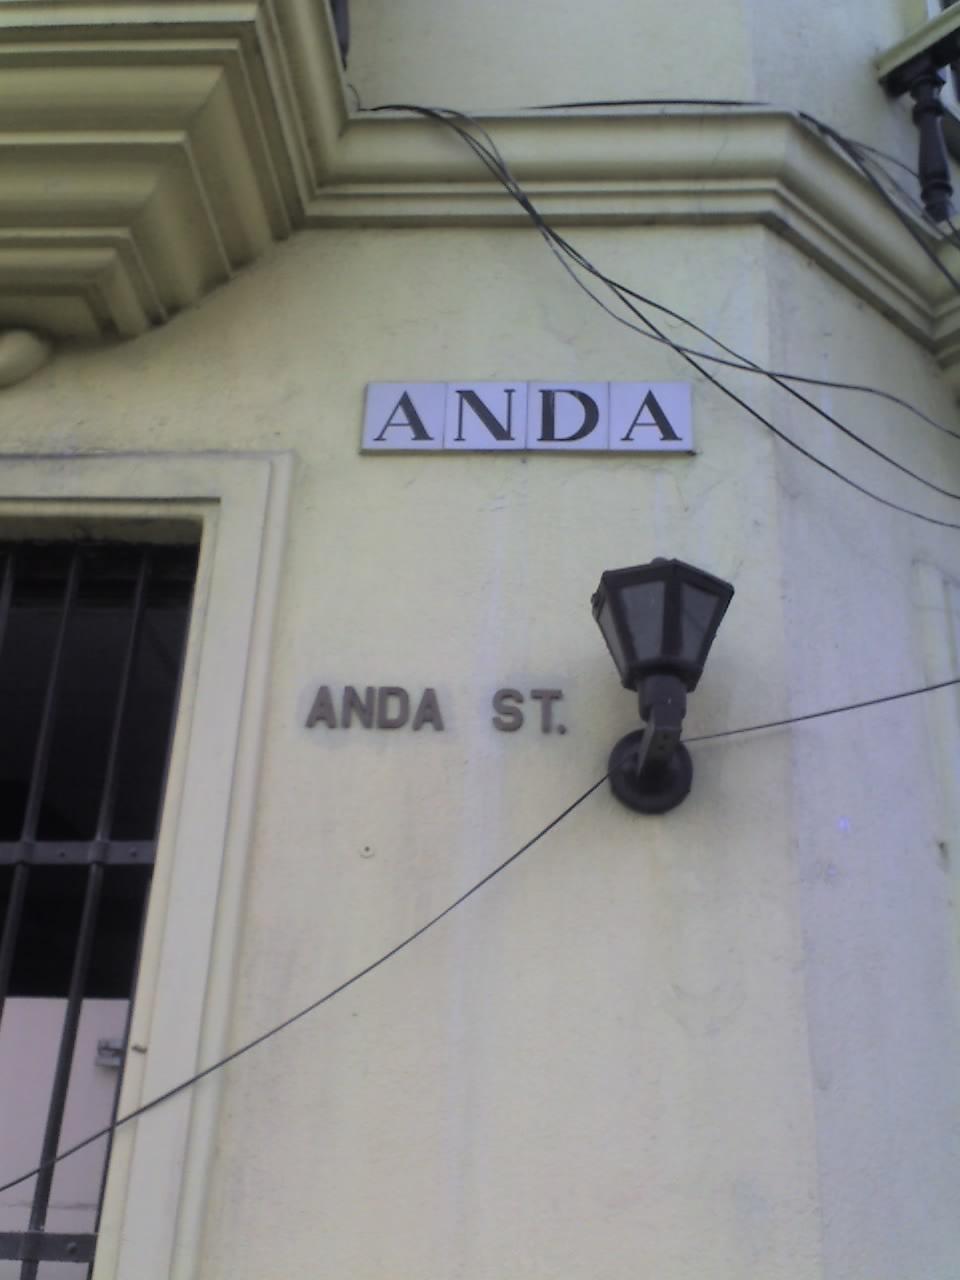 ANDA STREET